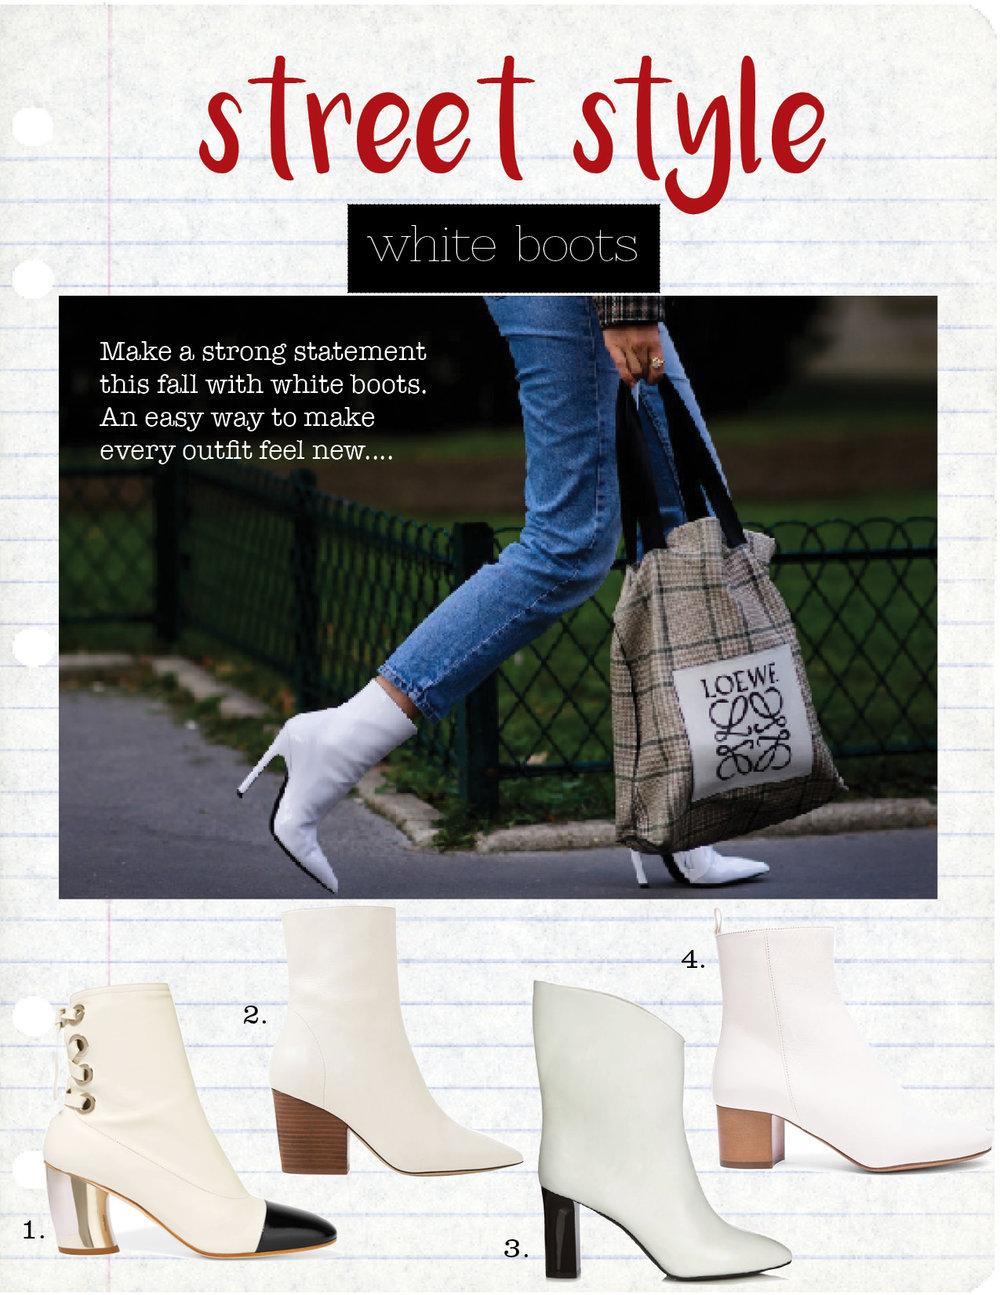 1. Proenza Schouler Ankle Boot, $995,  net-a-porter.com  2. Iro Bootie, $480,  iroparis.com  3. Acne Ankle Boot, $792,  matchesfashion.com  4. Isabel Marant Boot, $585, fwrd.com